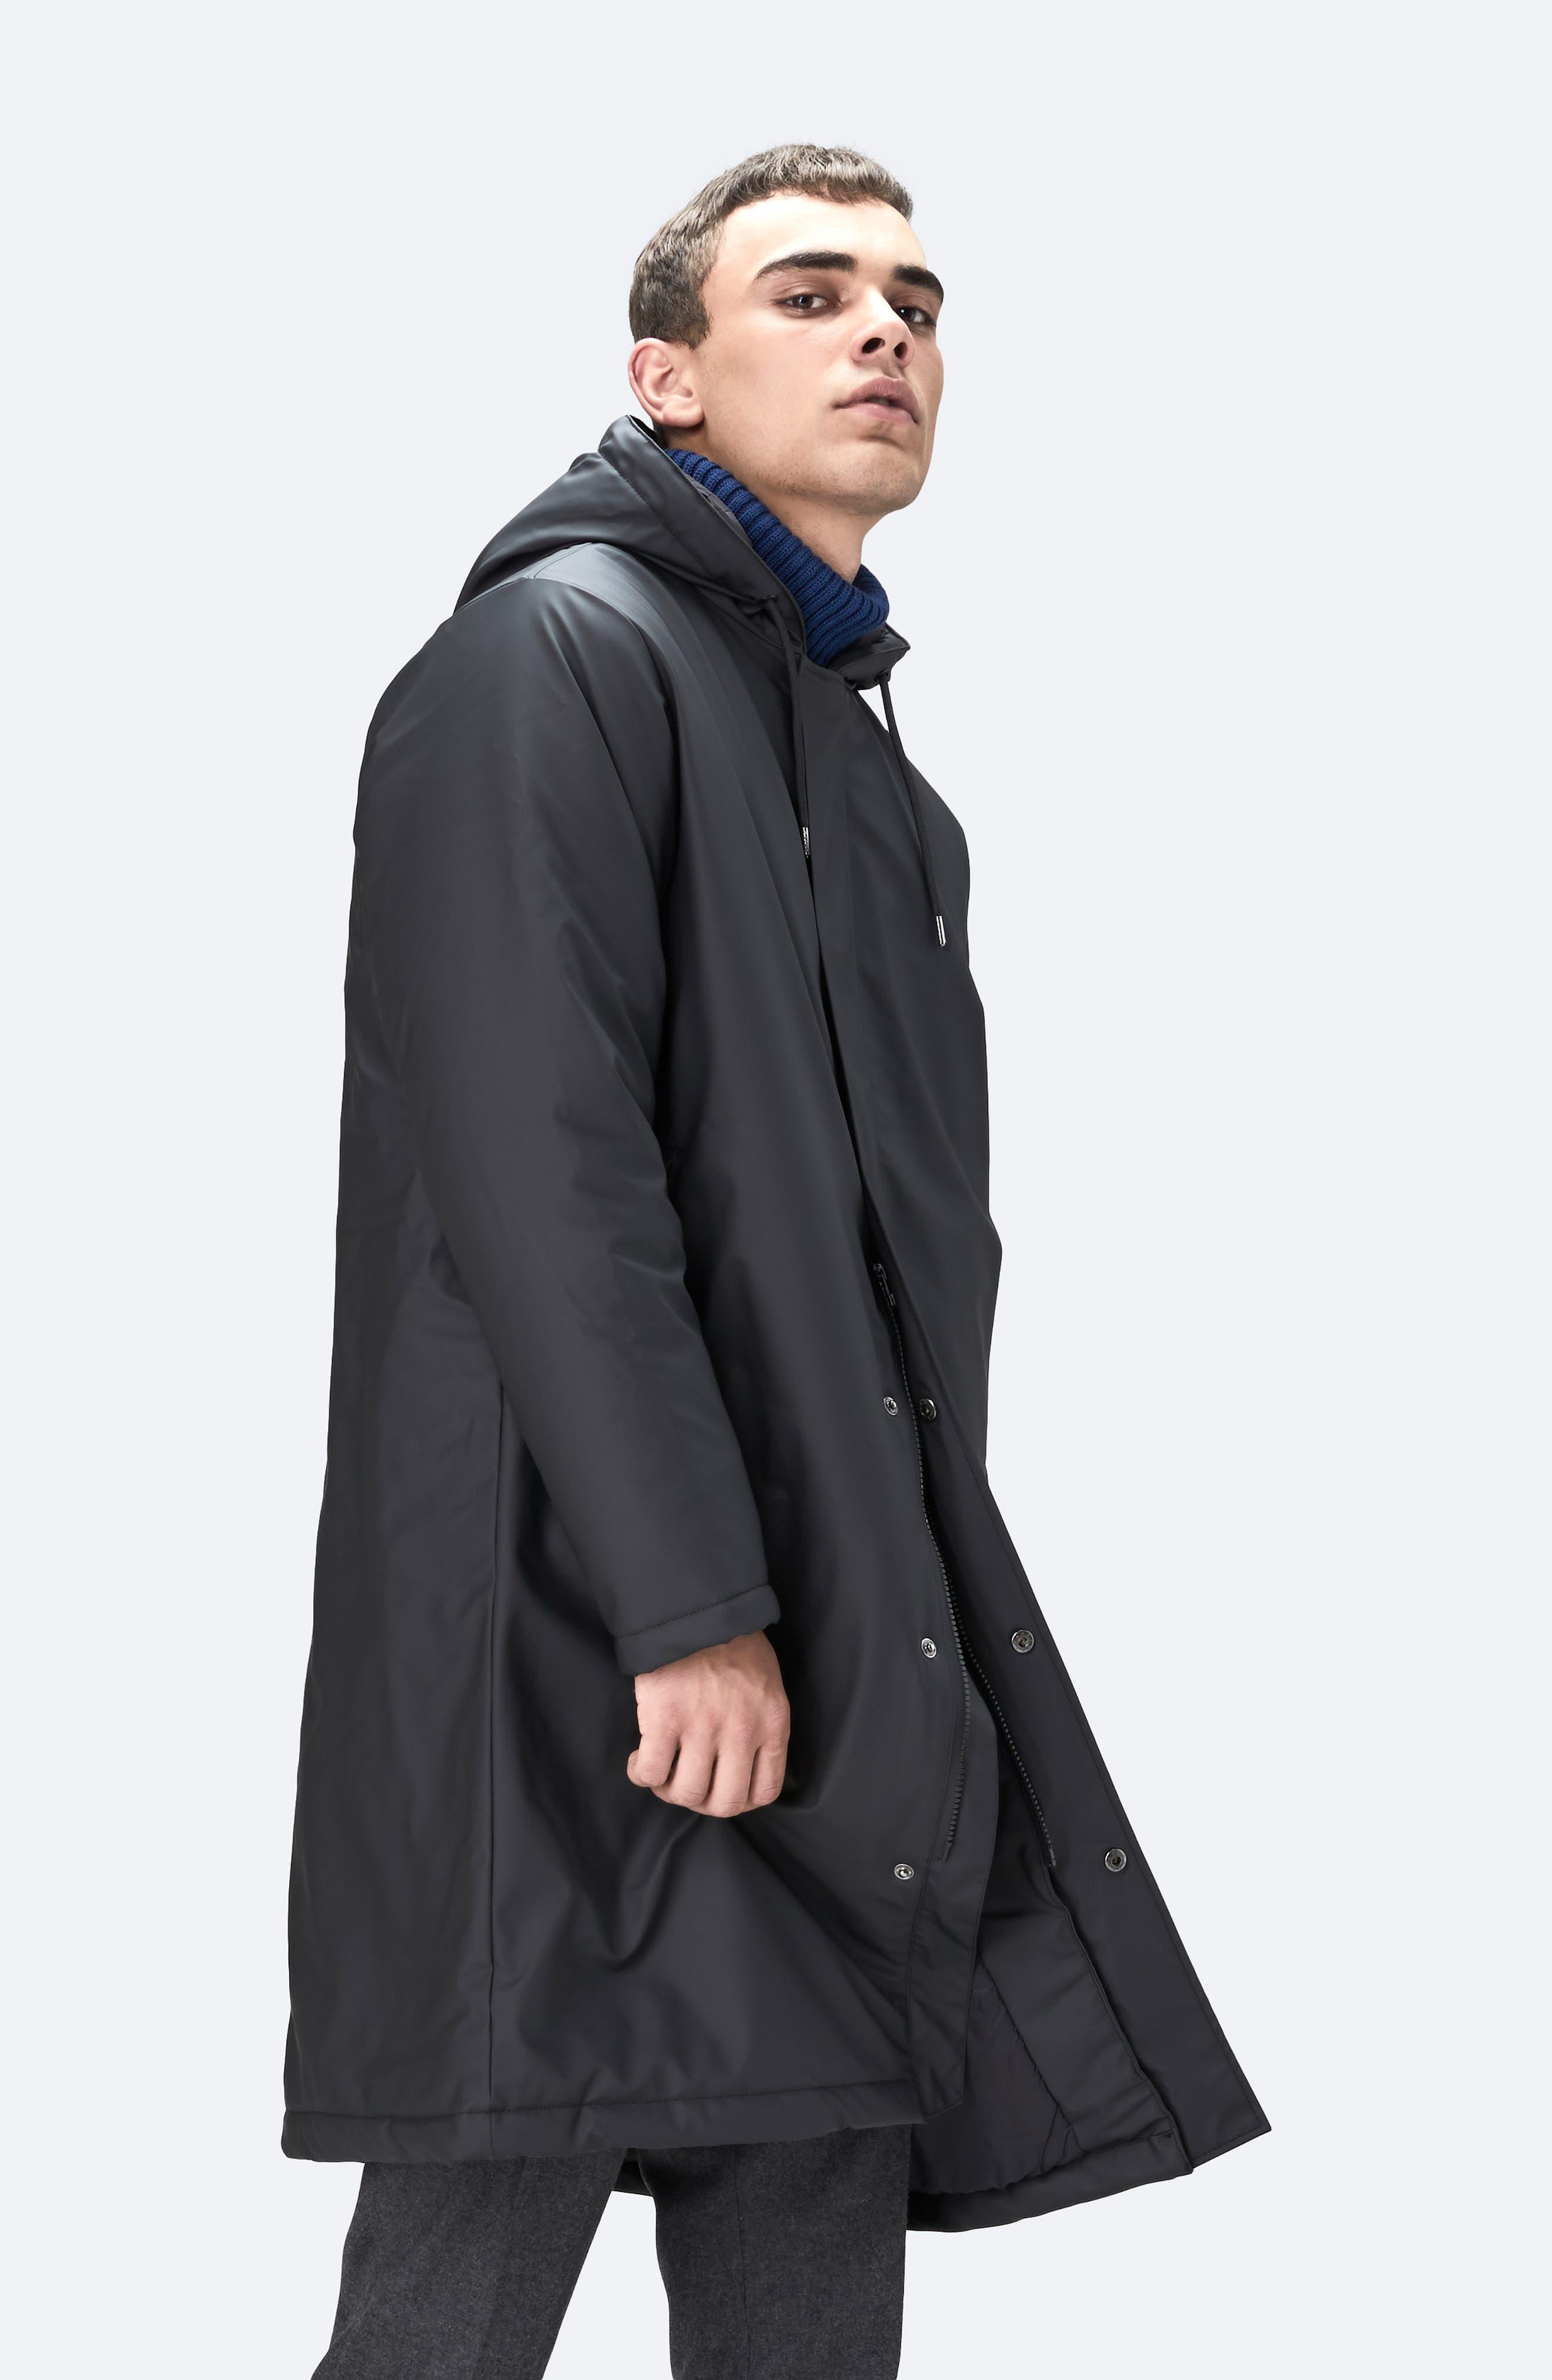 Thermal Hooded Raincoat,                             Alternate thumbnail 9, color,                             BLACK